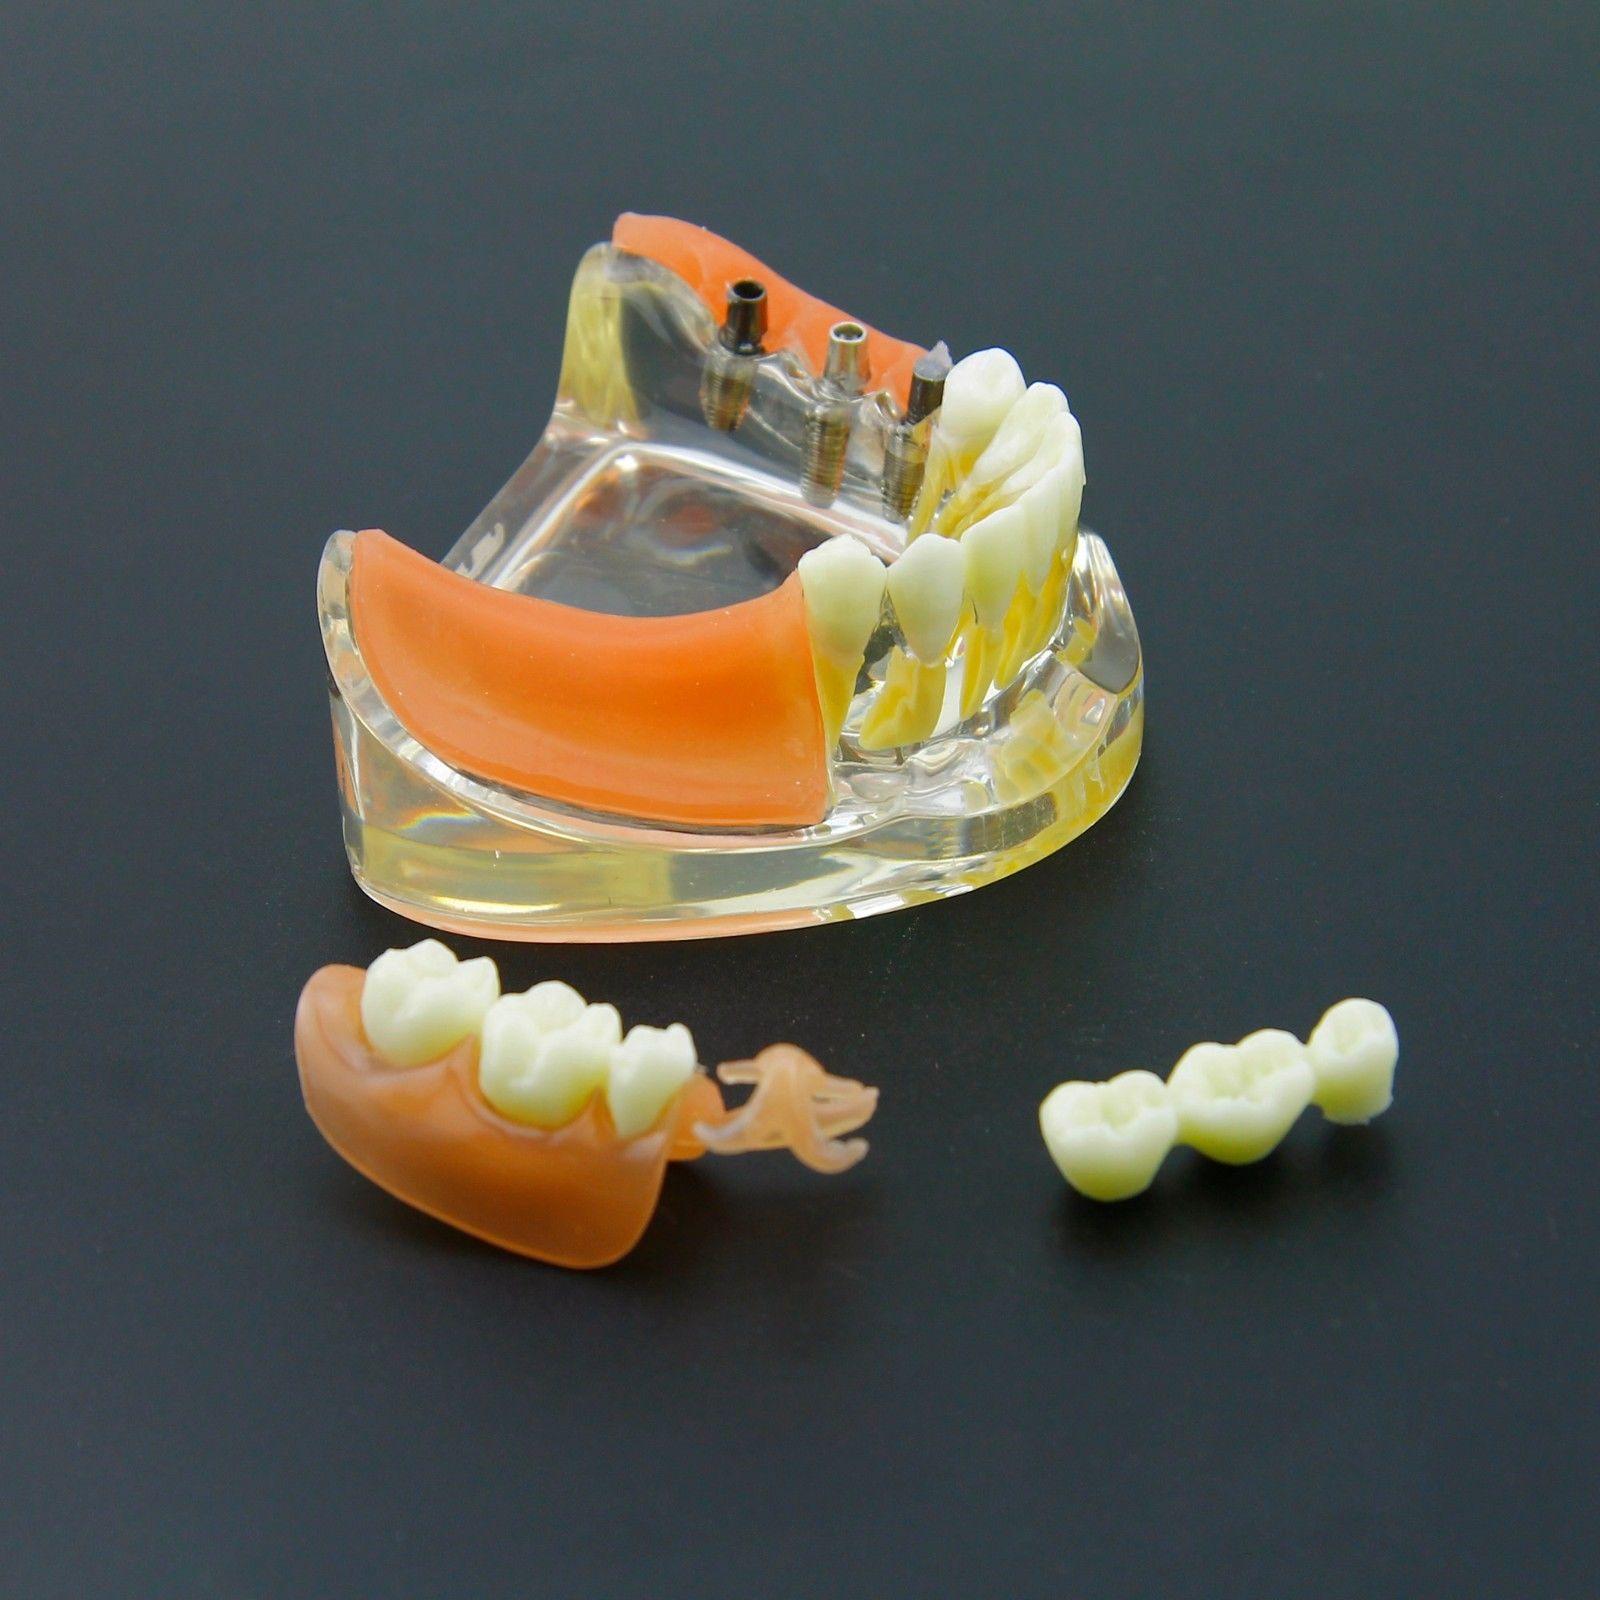 Dental Implant Restoration Teeth Model Removable Bridge Denture Demo 6006